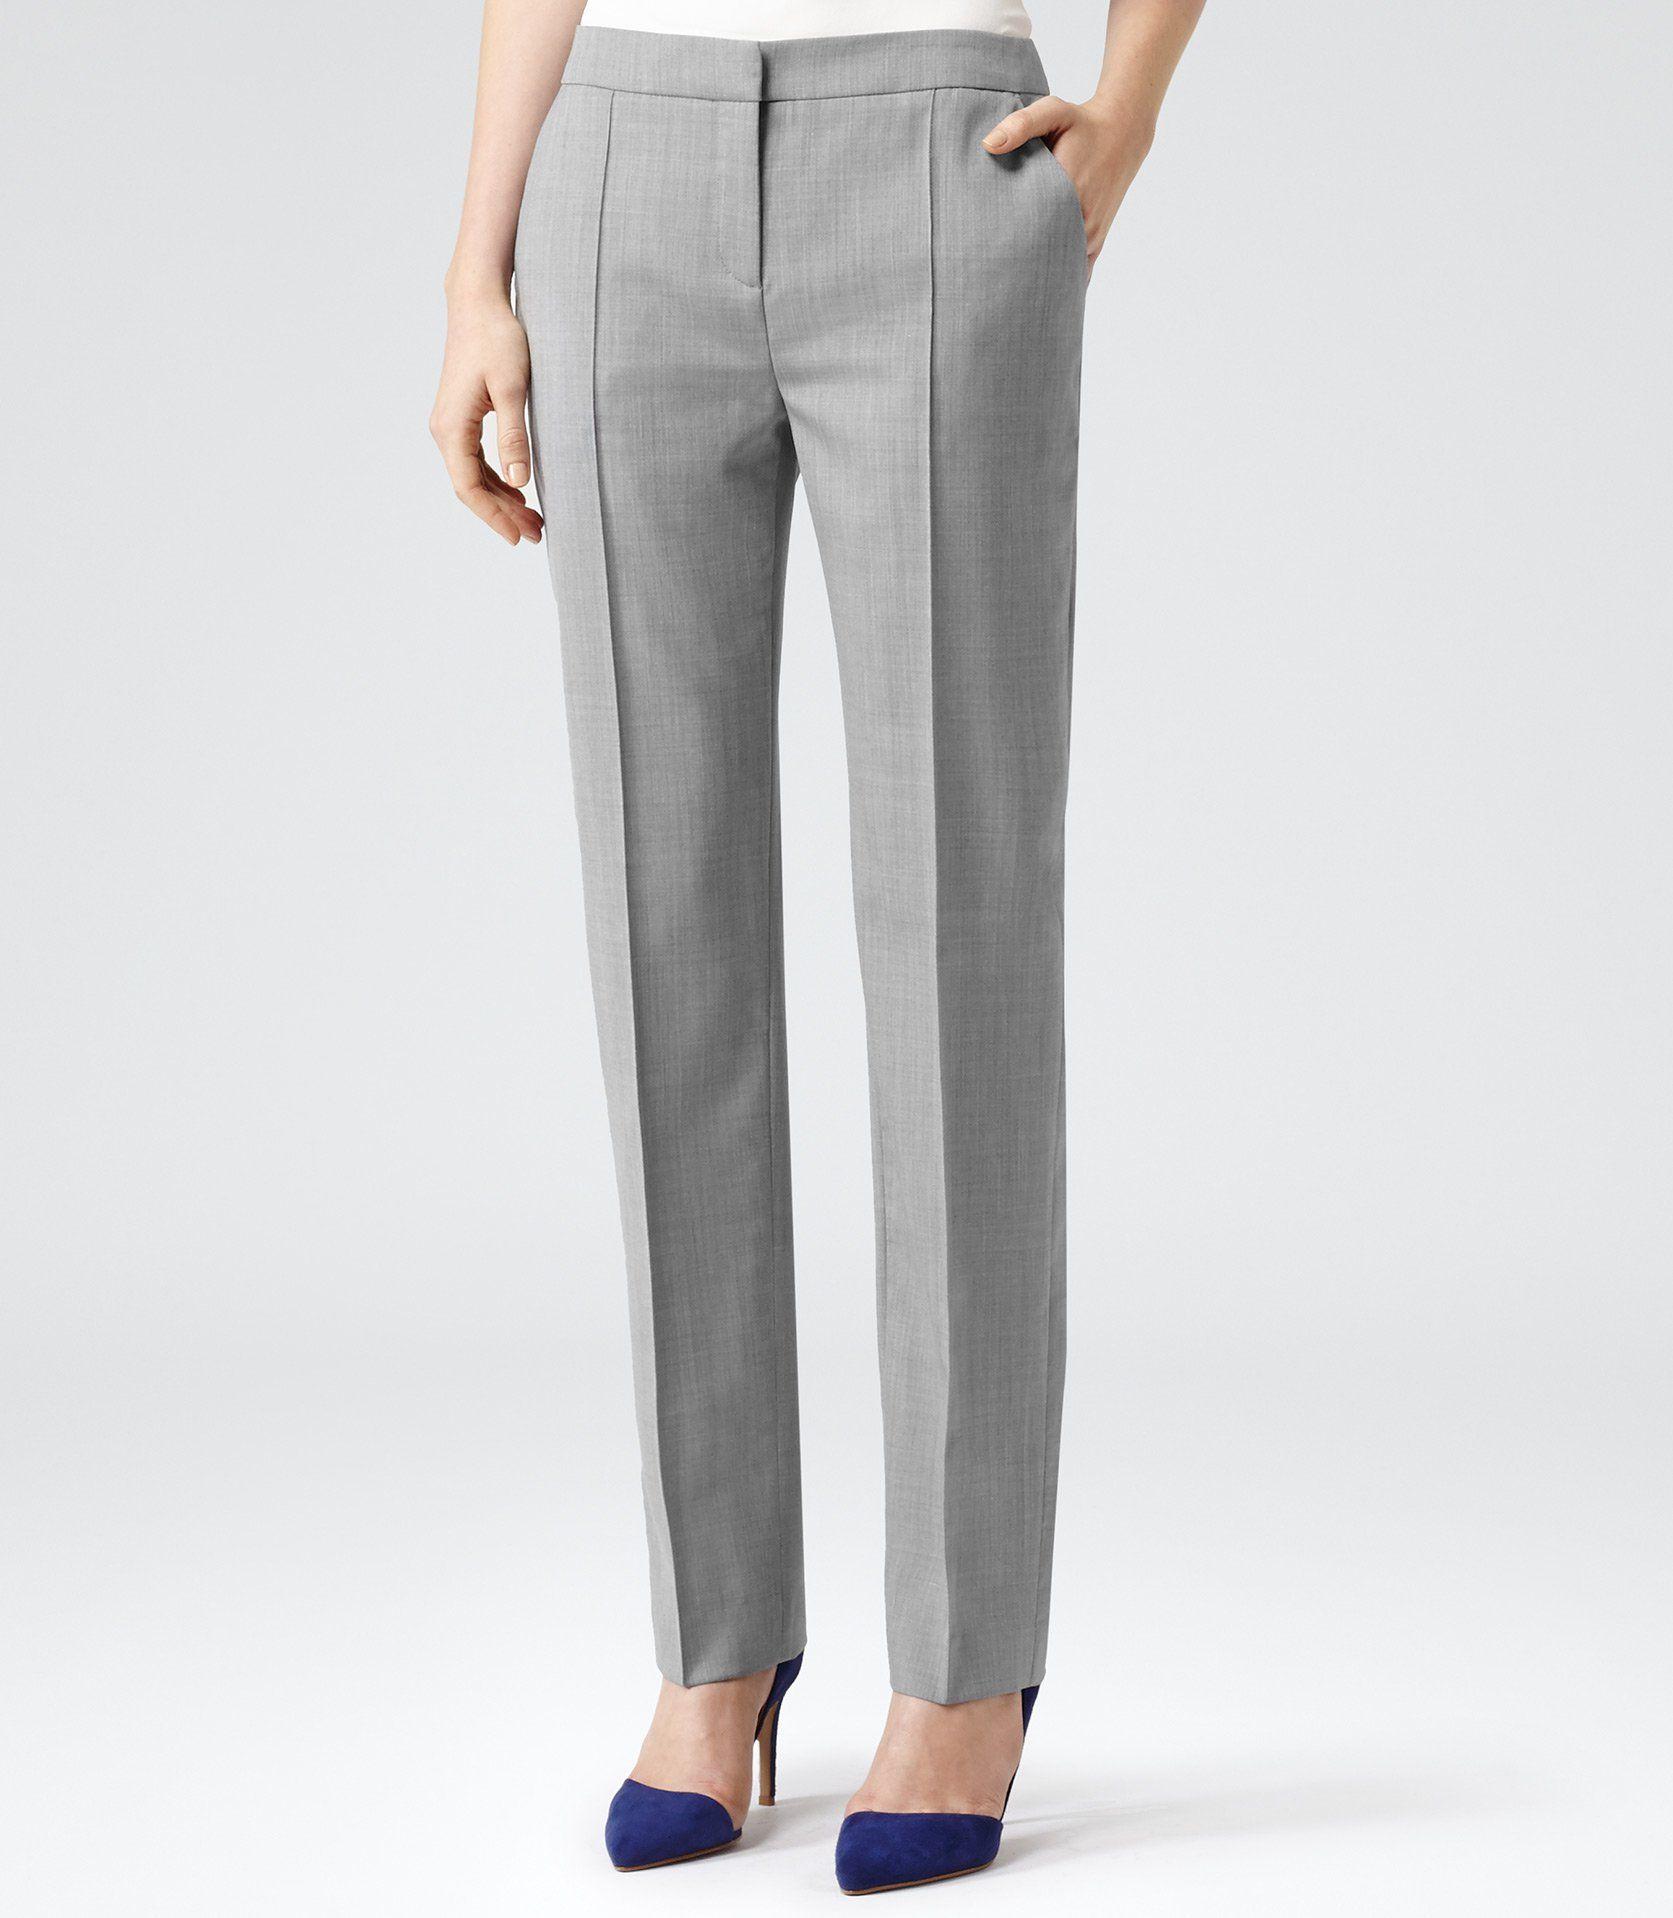 Tailored pants  Formal pants women, Pants for women, Trousers women